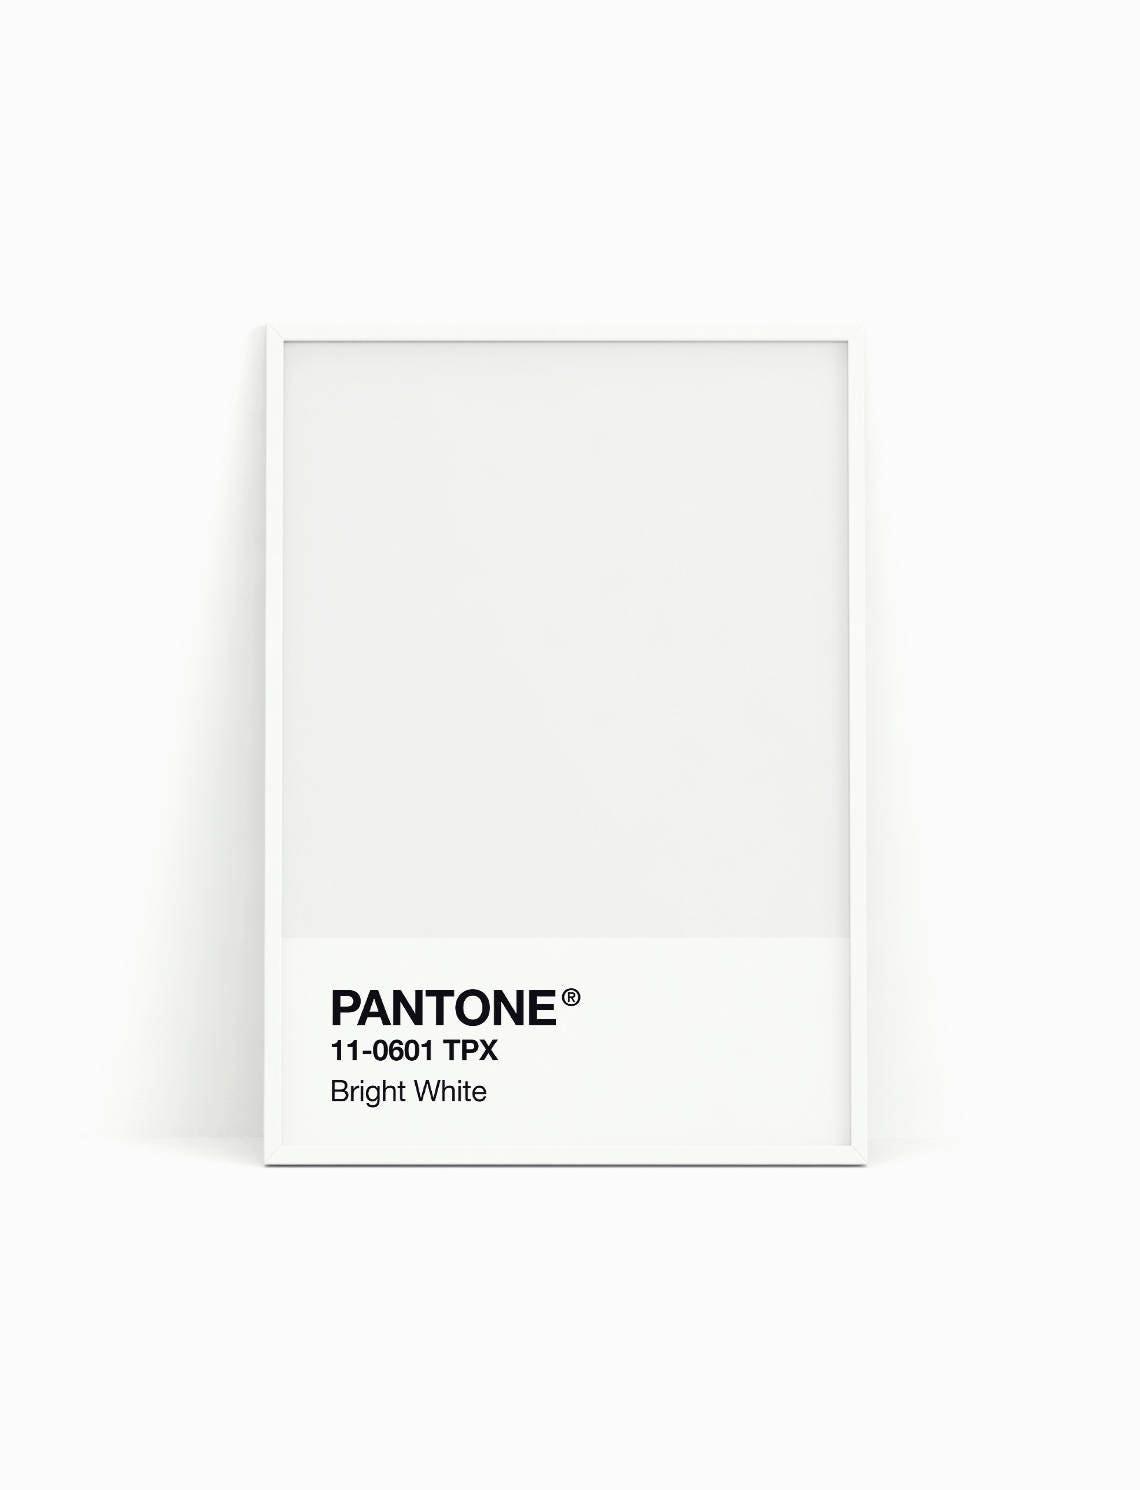 pantone print pantone poster pantone bright white. Black Bedroom Furniture Sets. Home Design Ideas